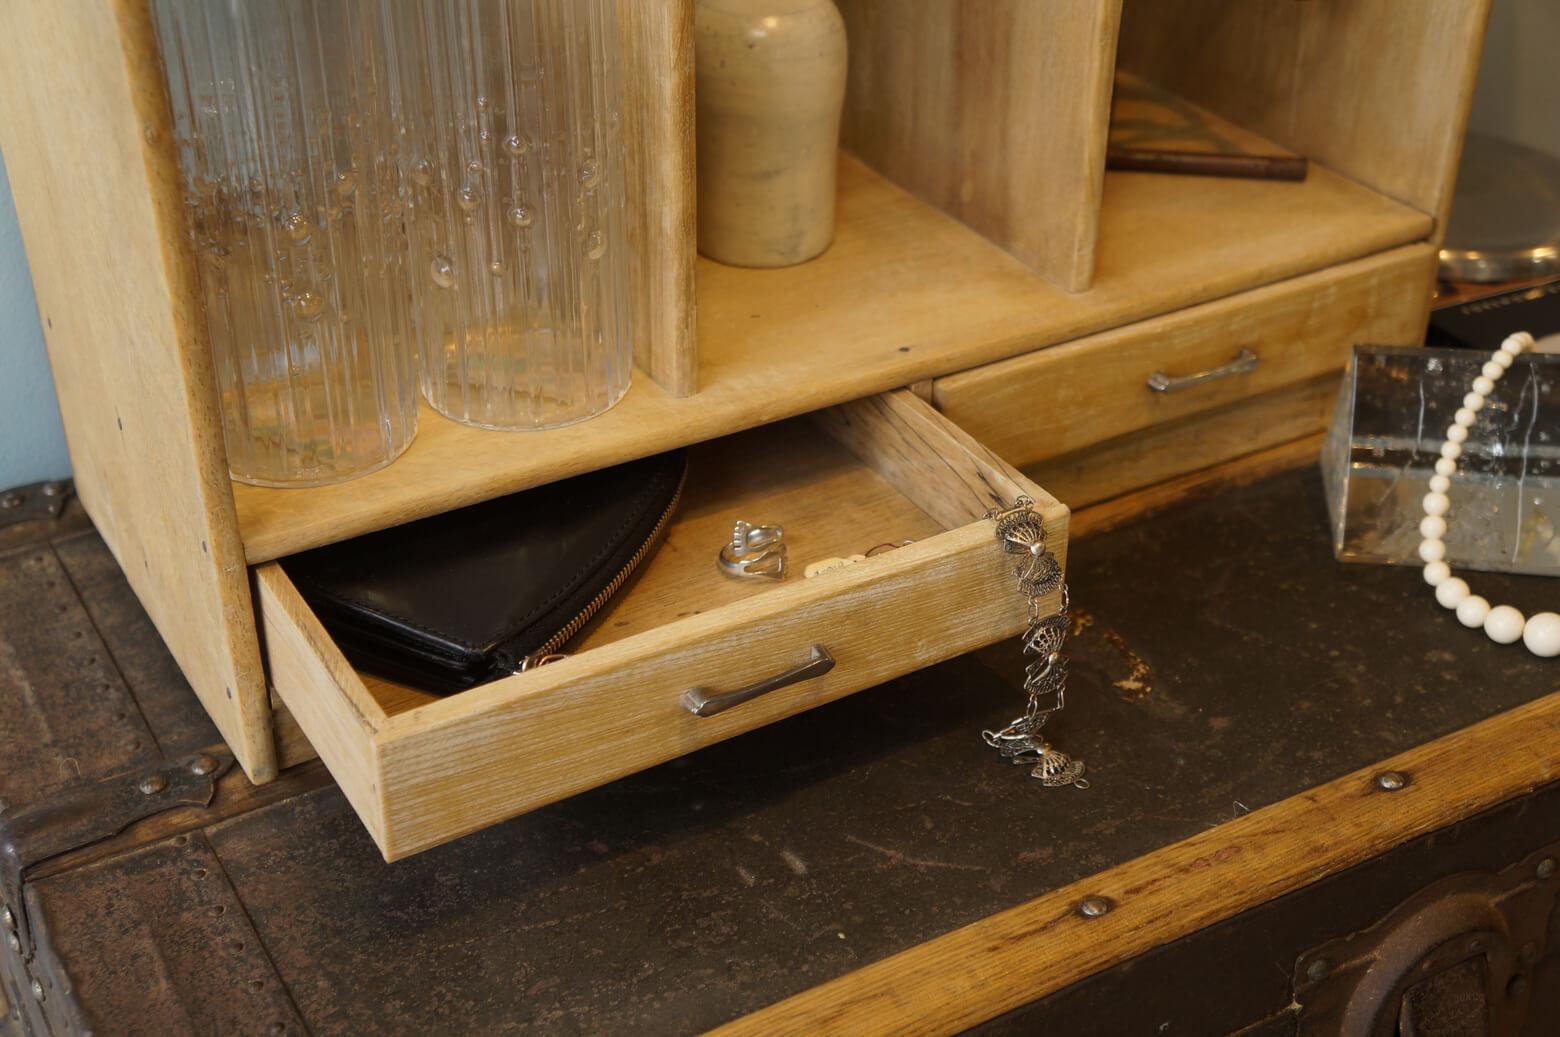 Japan vintage Retro Wooden Bookend/ヴィンテージ 木製 本立て ブックエンド レトロ